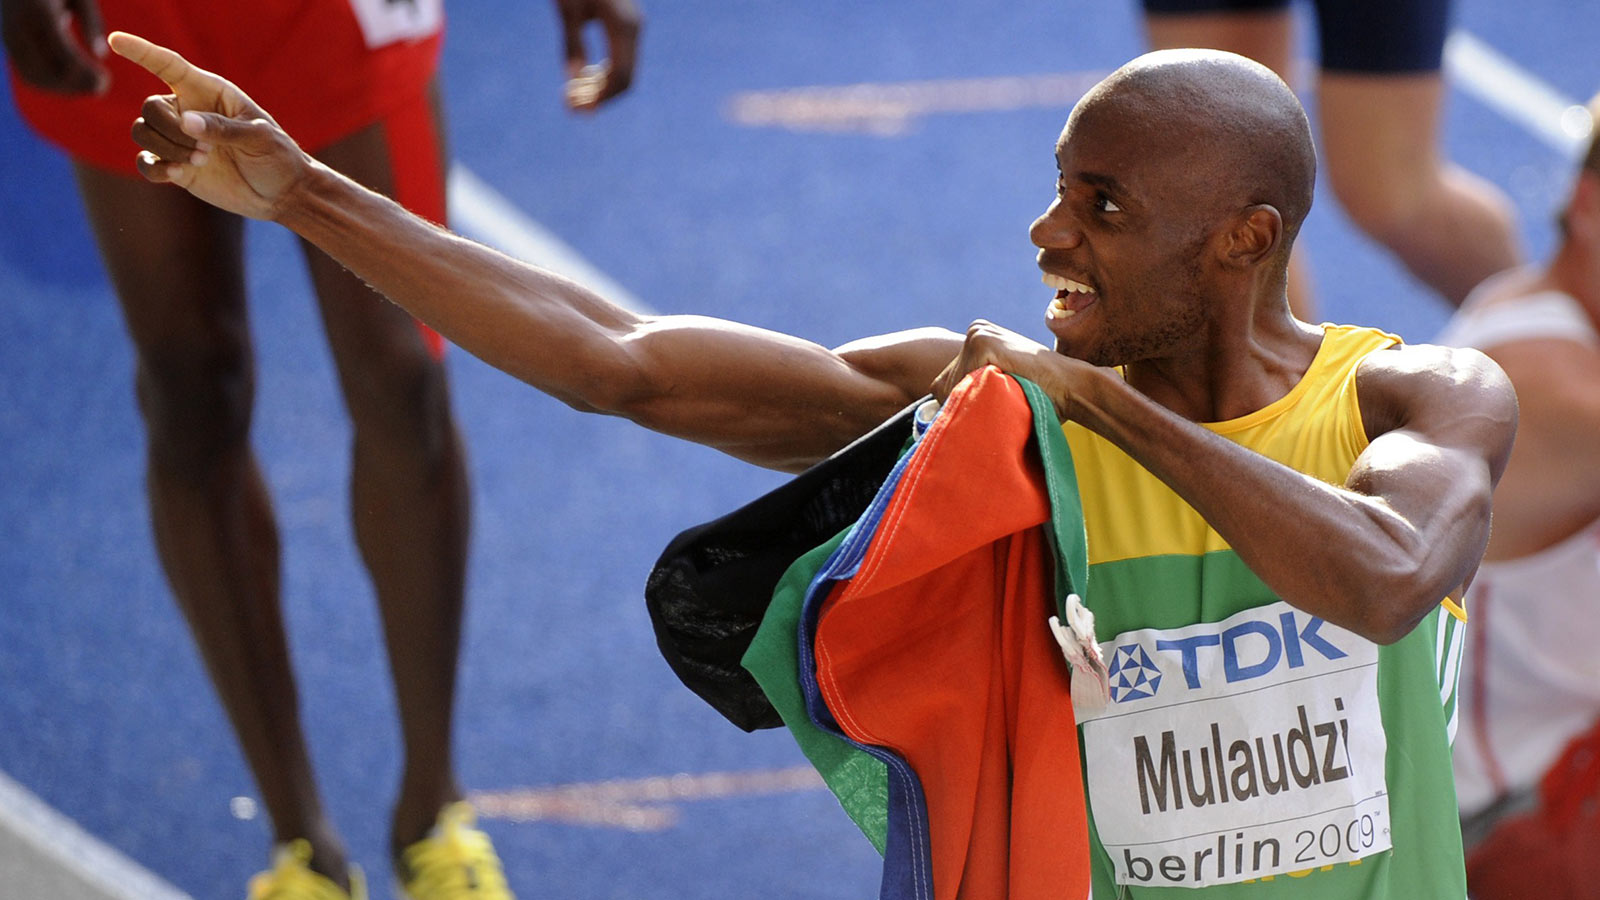 Призёр Олимпиады в Афинах в беге на 800 м Мбулаени Мулаудзи погиб в автокатастрофе